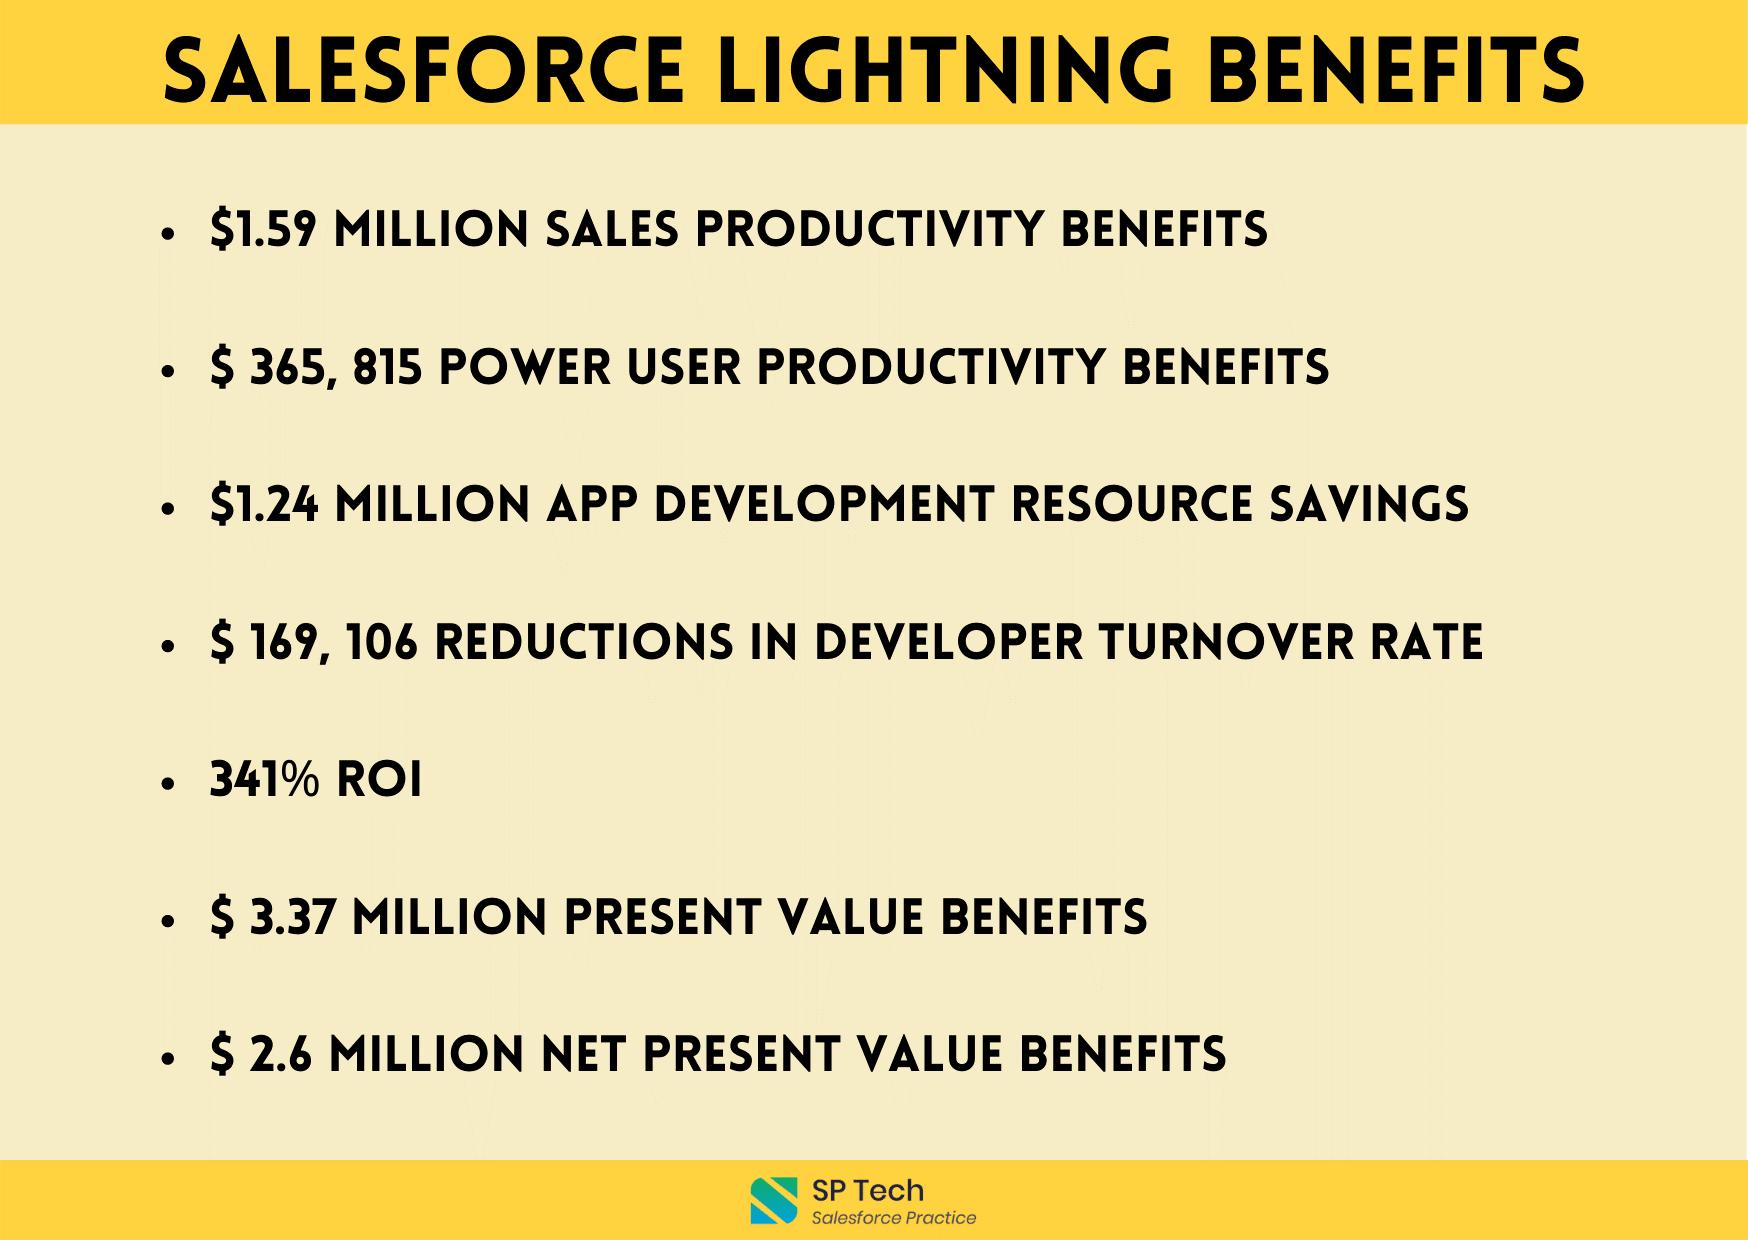 Salesforce Lightning Benefits